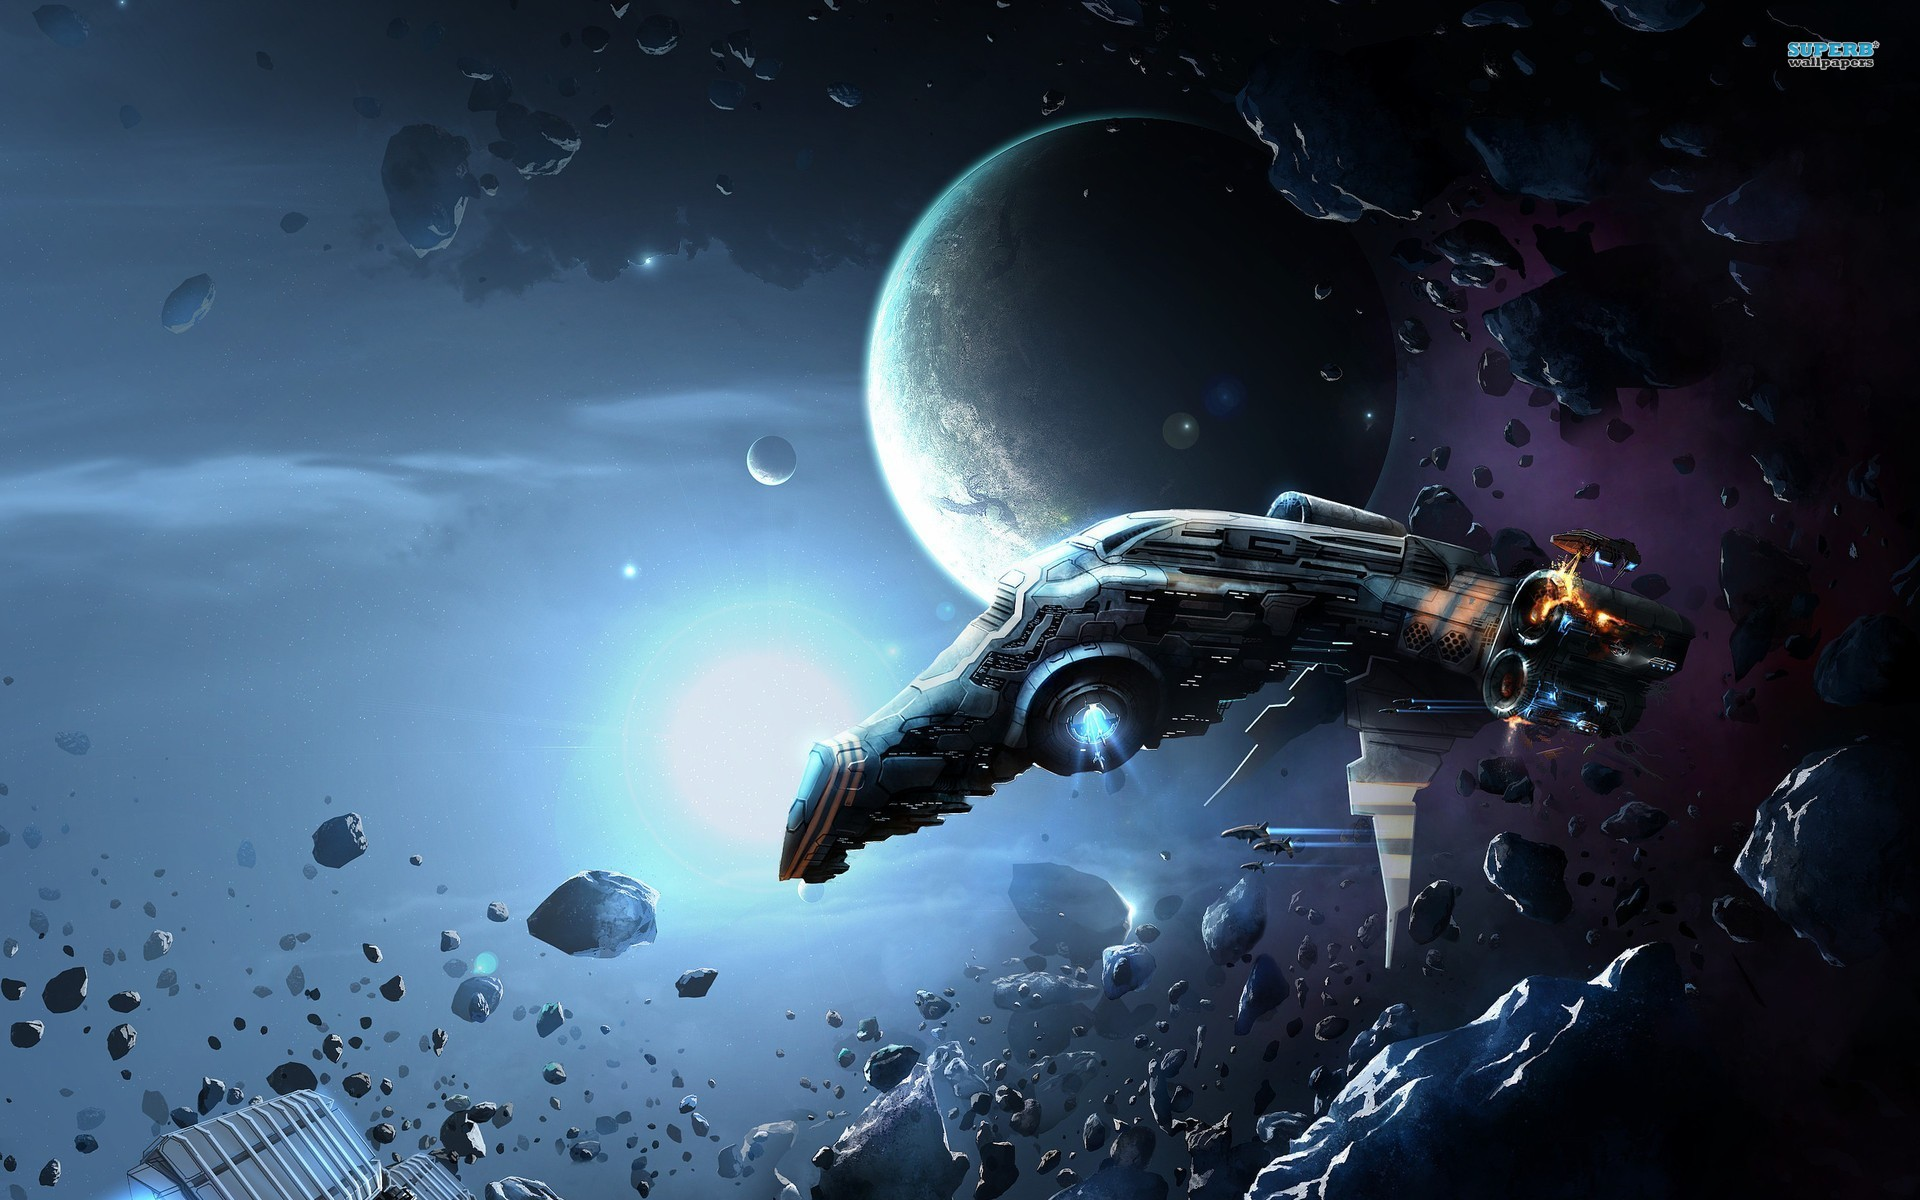 spaceship-12461-1920x1200